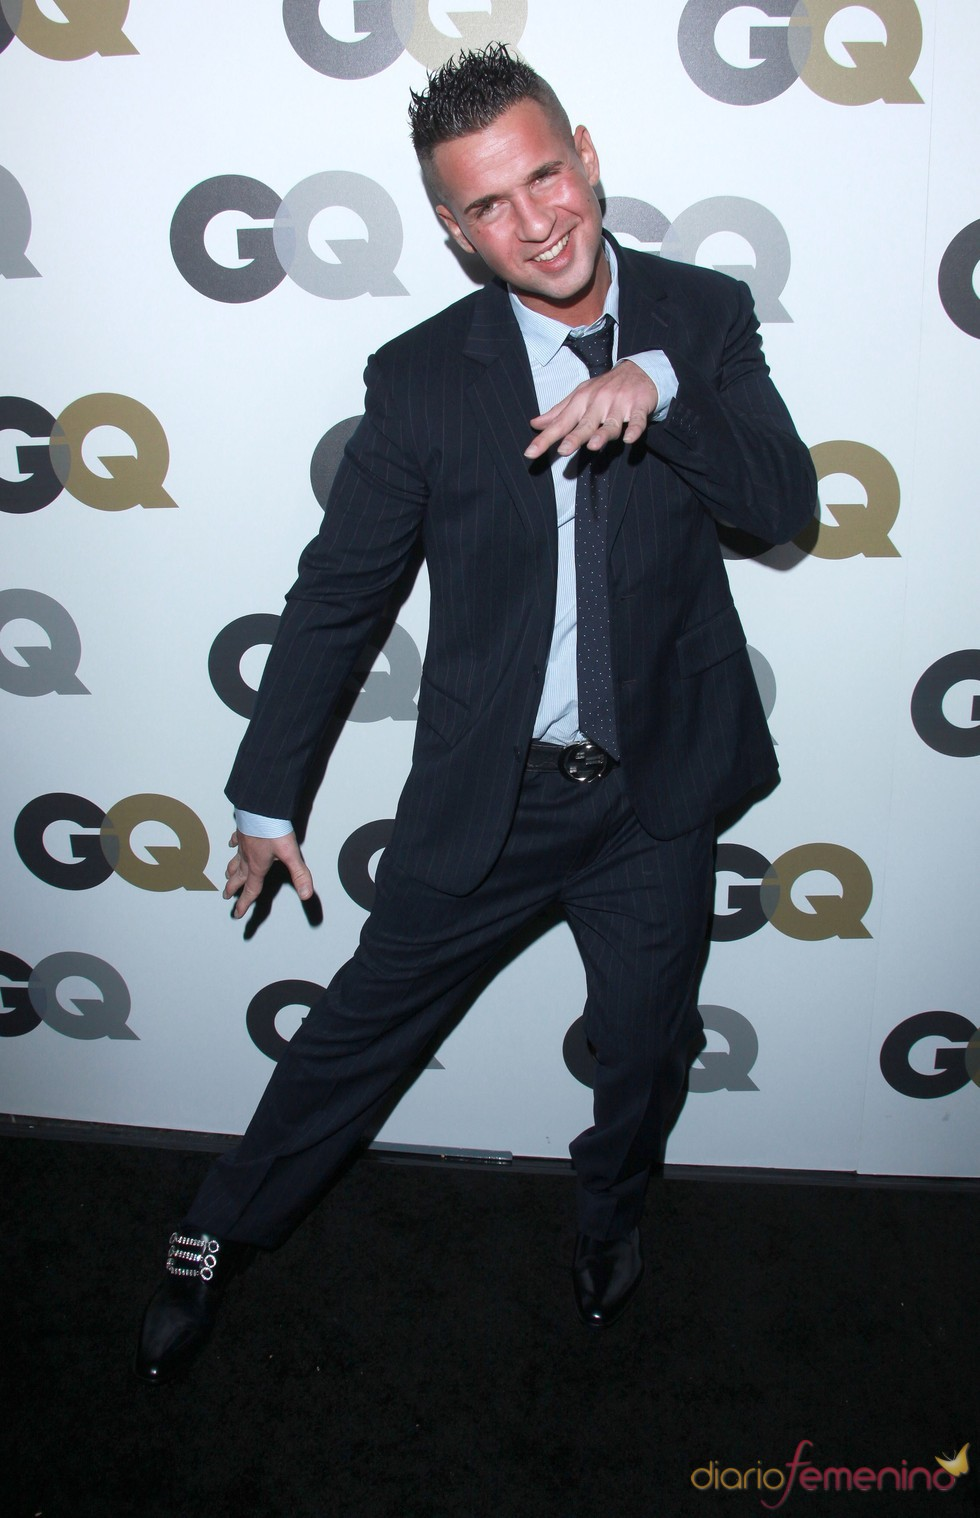 Mike Sorrentino en la Fiesta GQ 2010